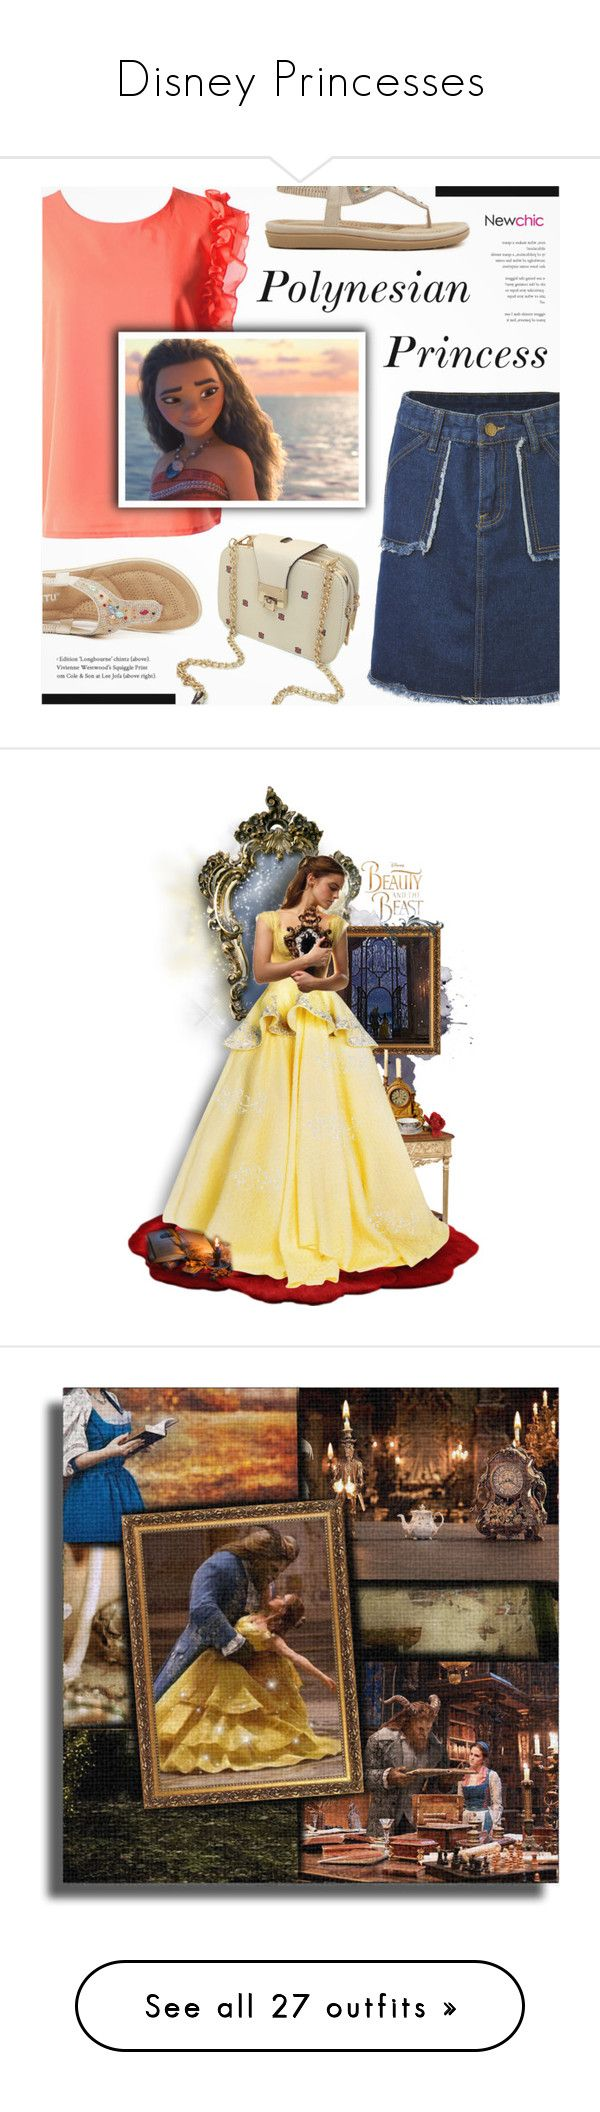 """Disney Princesses"" by lizabeth-rose ❤ liked on Polyvore featuring Disney, art, swimwear, one-piece swimsuits, black, flounce swimsuit, bandeau swim suit, polka dot one-piece swimsuits, swimming costume and ruffle swimsuit"